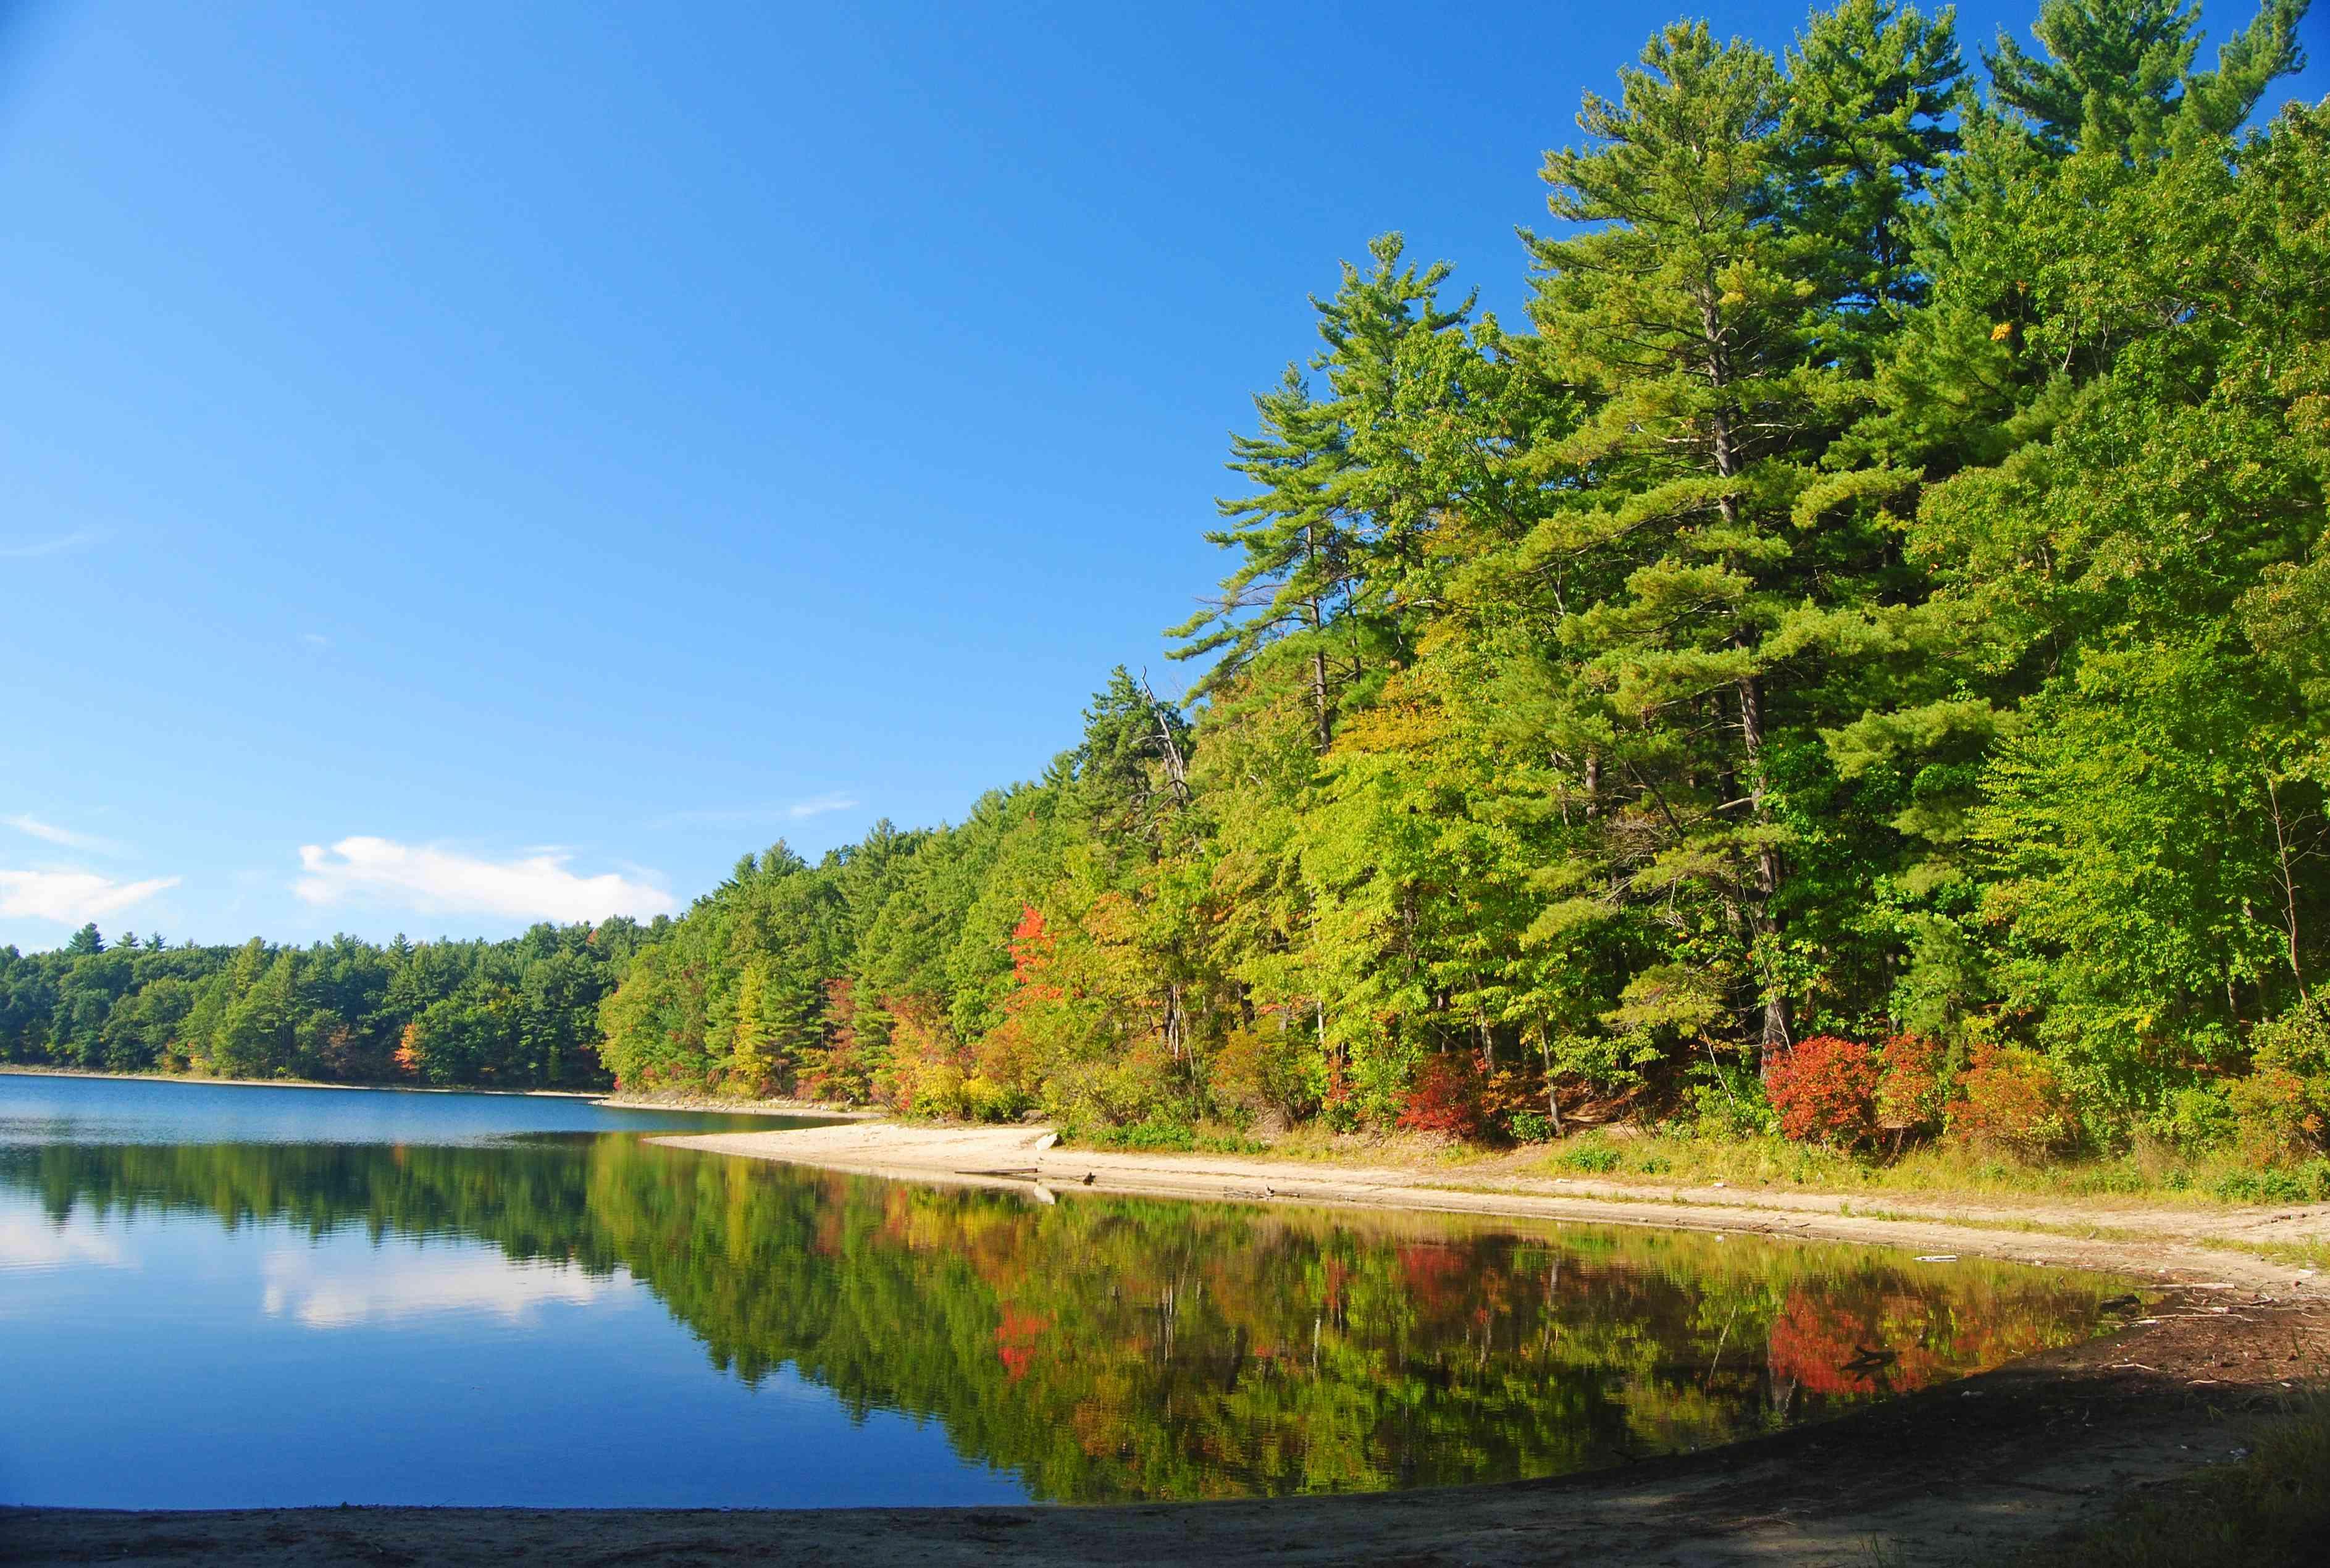 The Walden Pond near Concord, MA